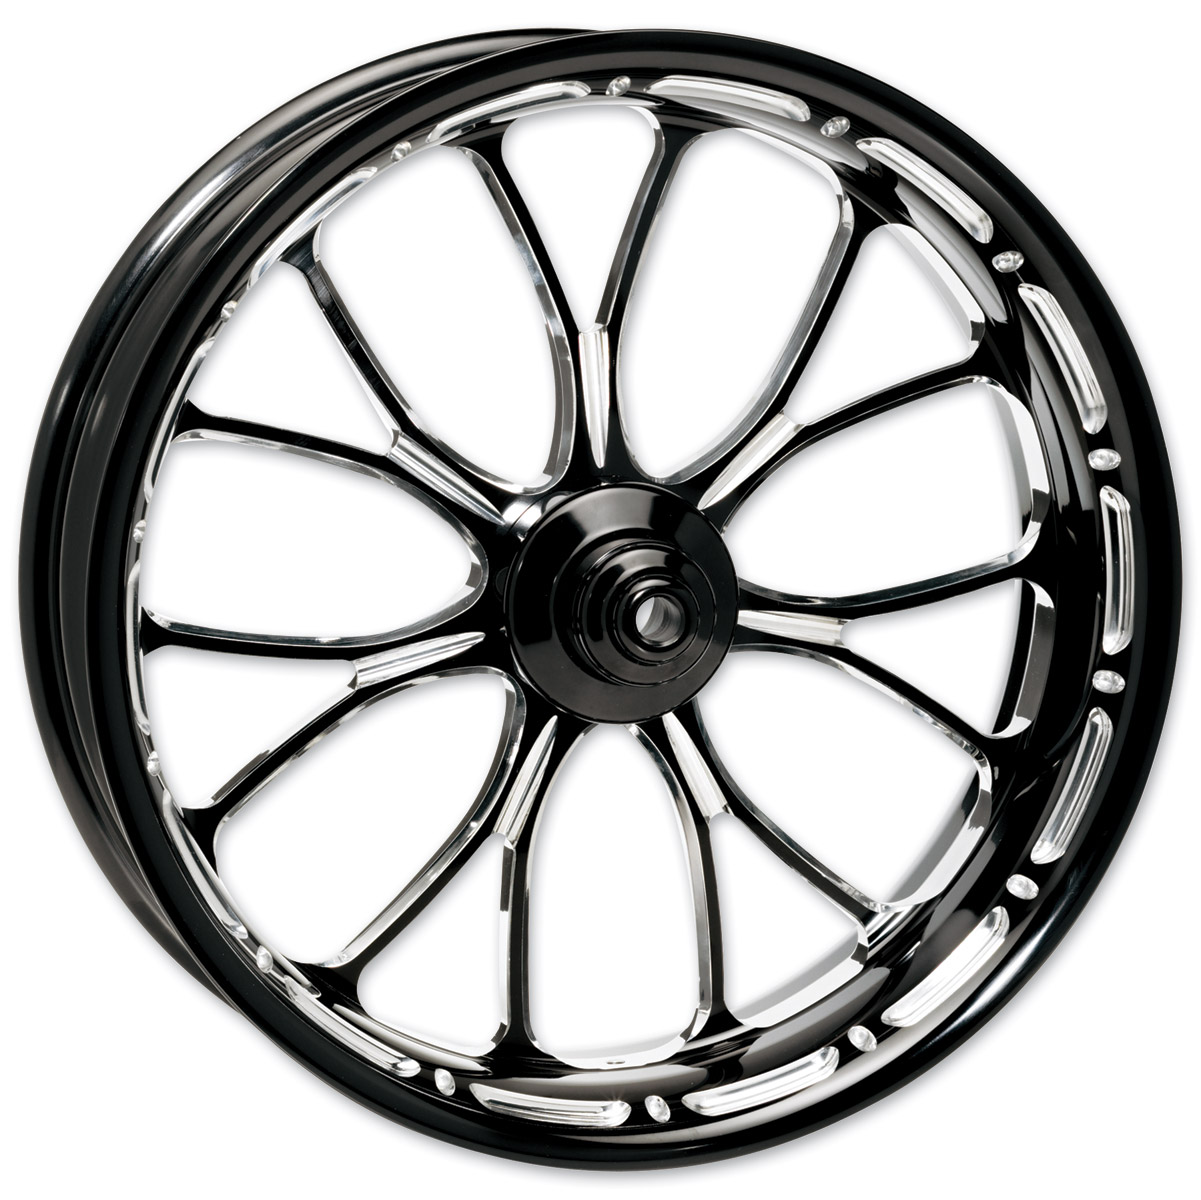 Performance Machine Contrast Cut Platinum Forged Heathen Front Wheel, 18